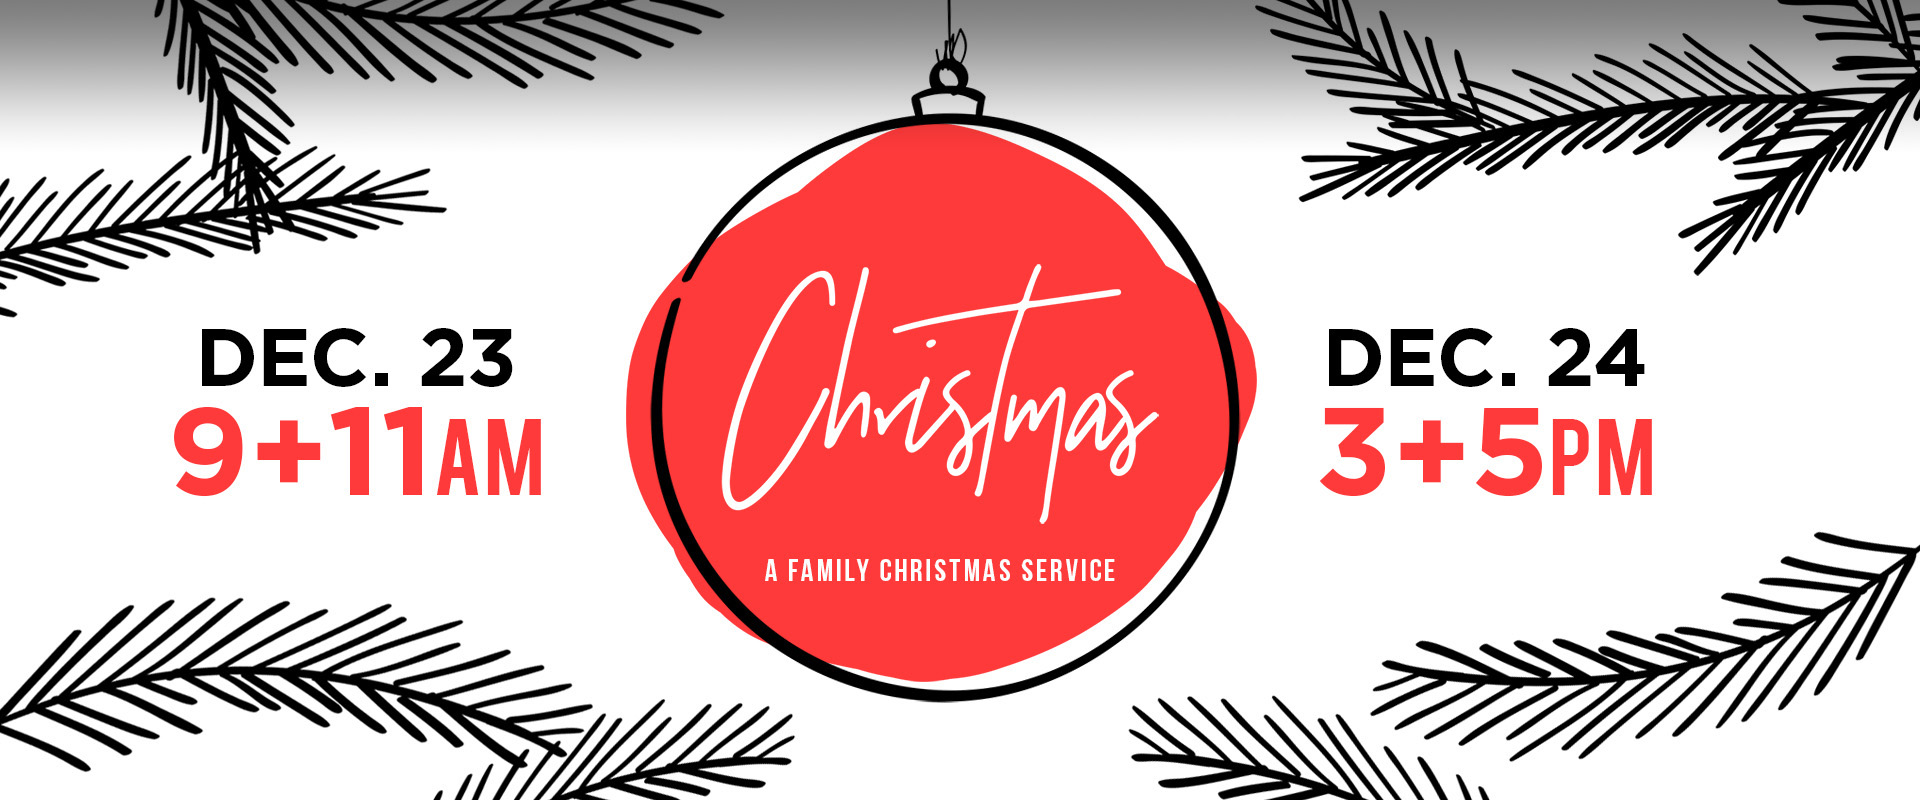 Christmas Eve Services - Dec. 23 & 24